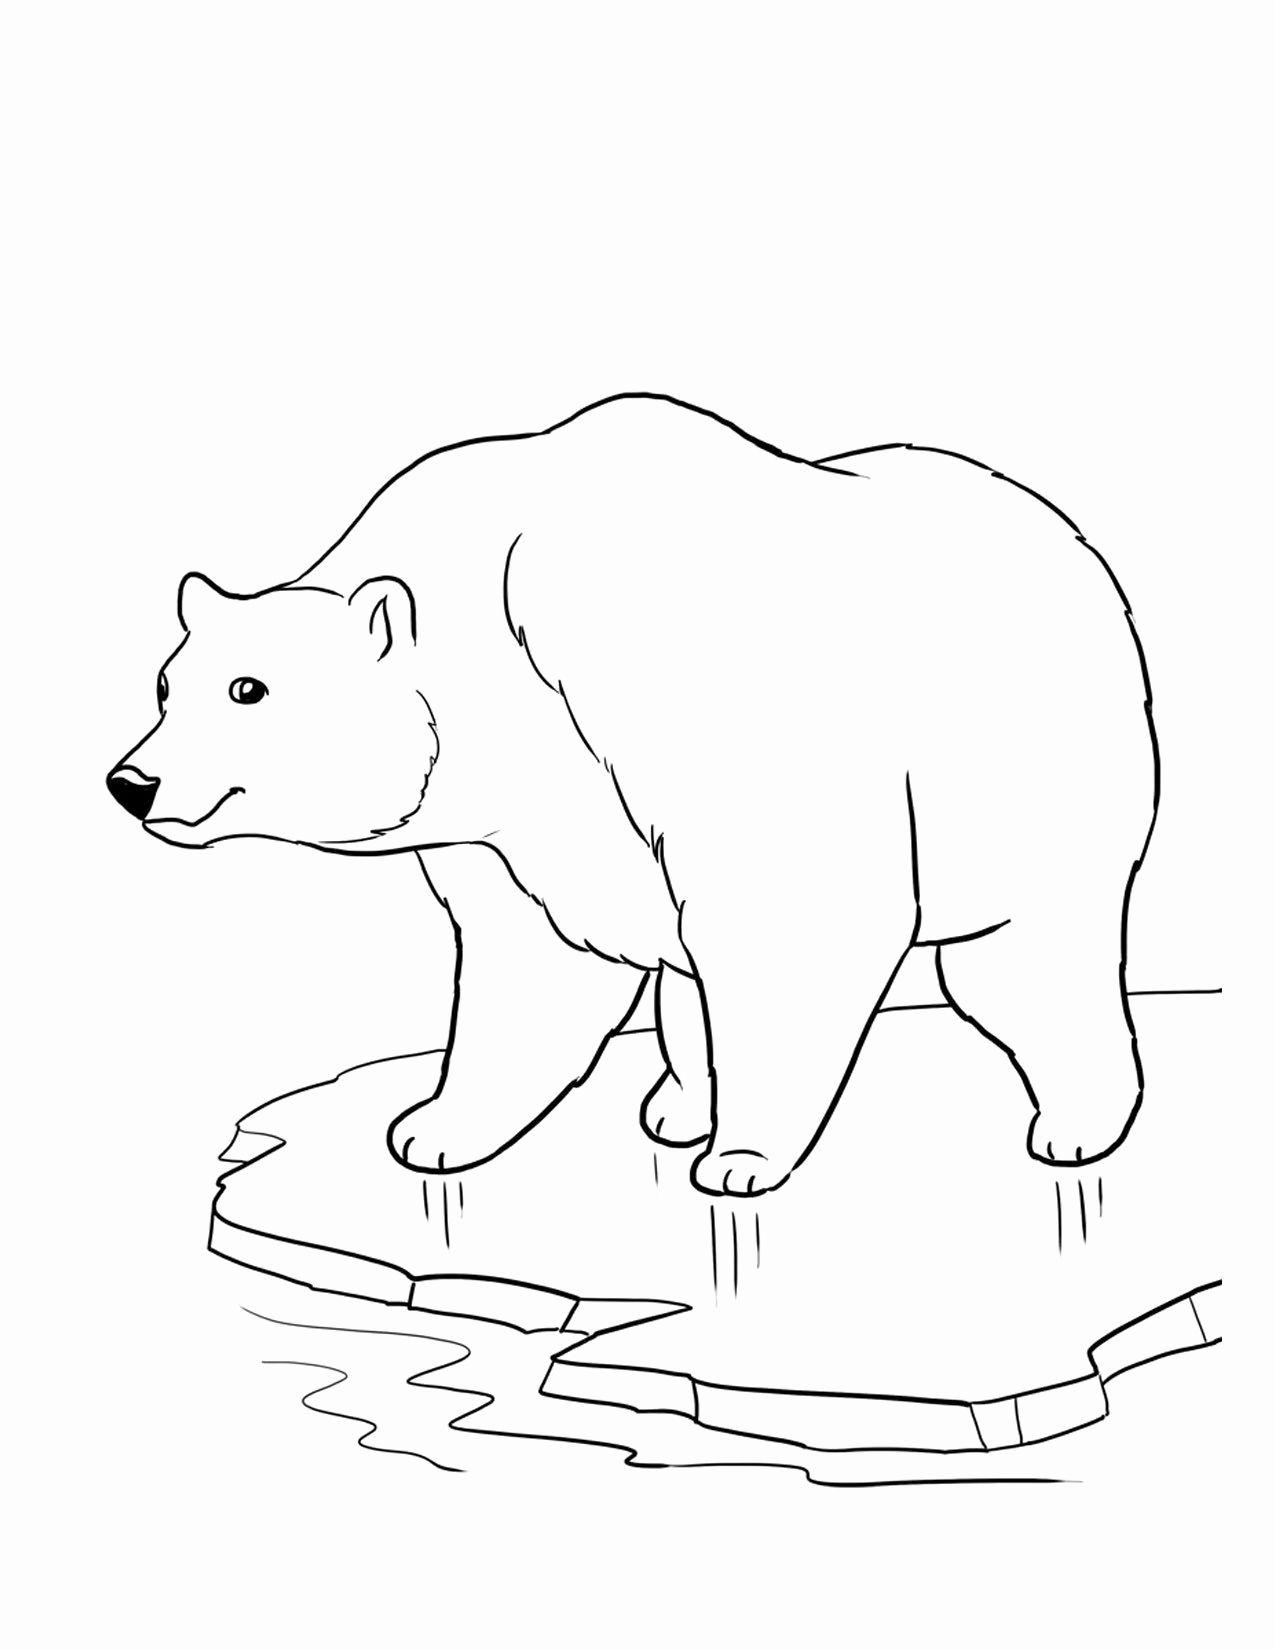 Polar Bear Eric Carle Coloring Pages in 2020 Polar bear